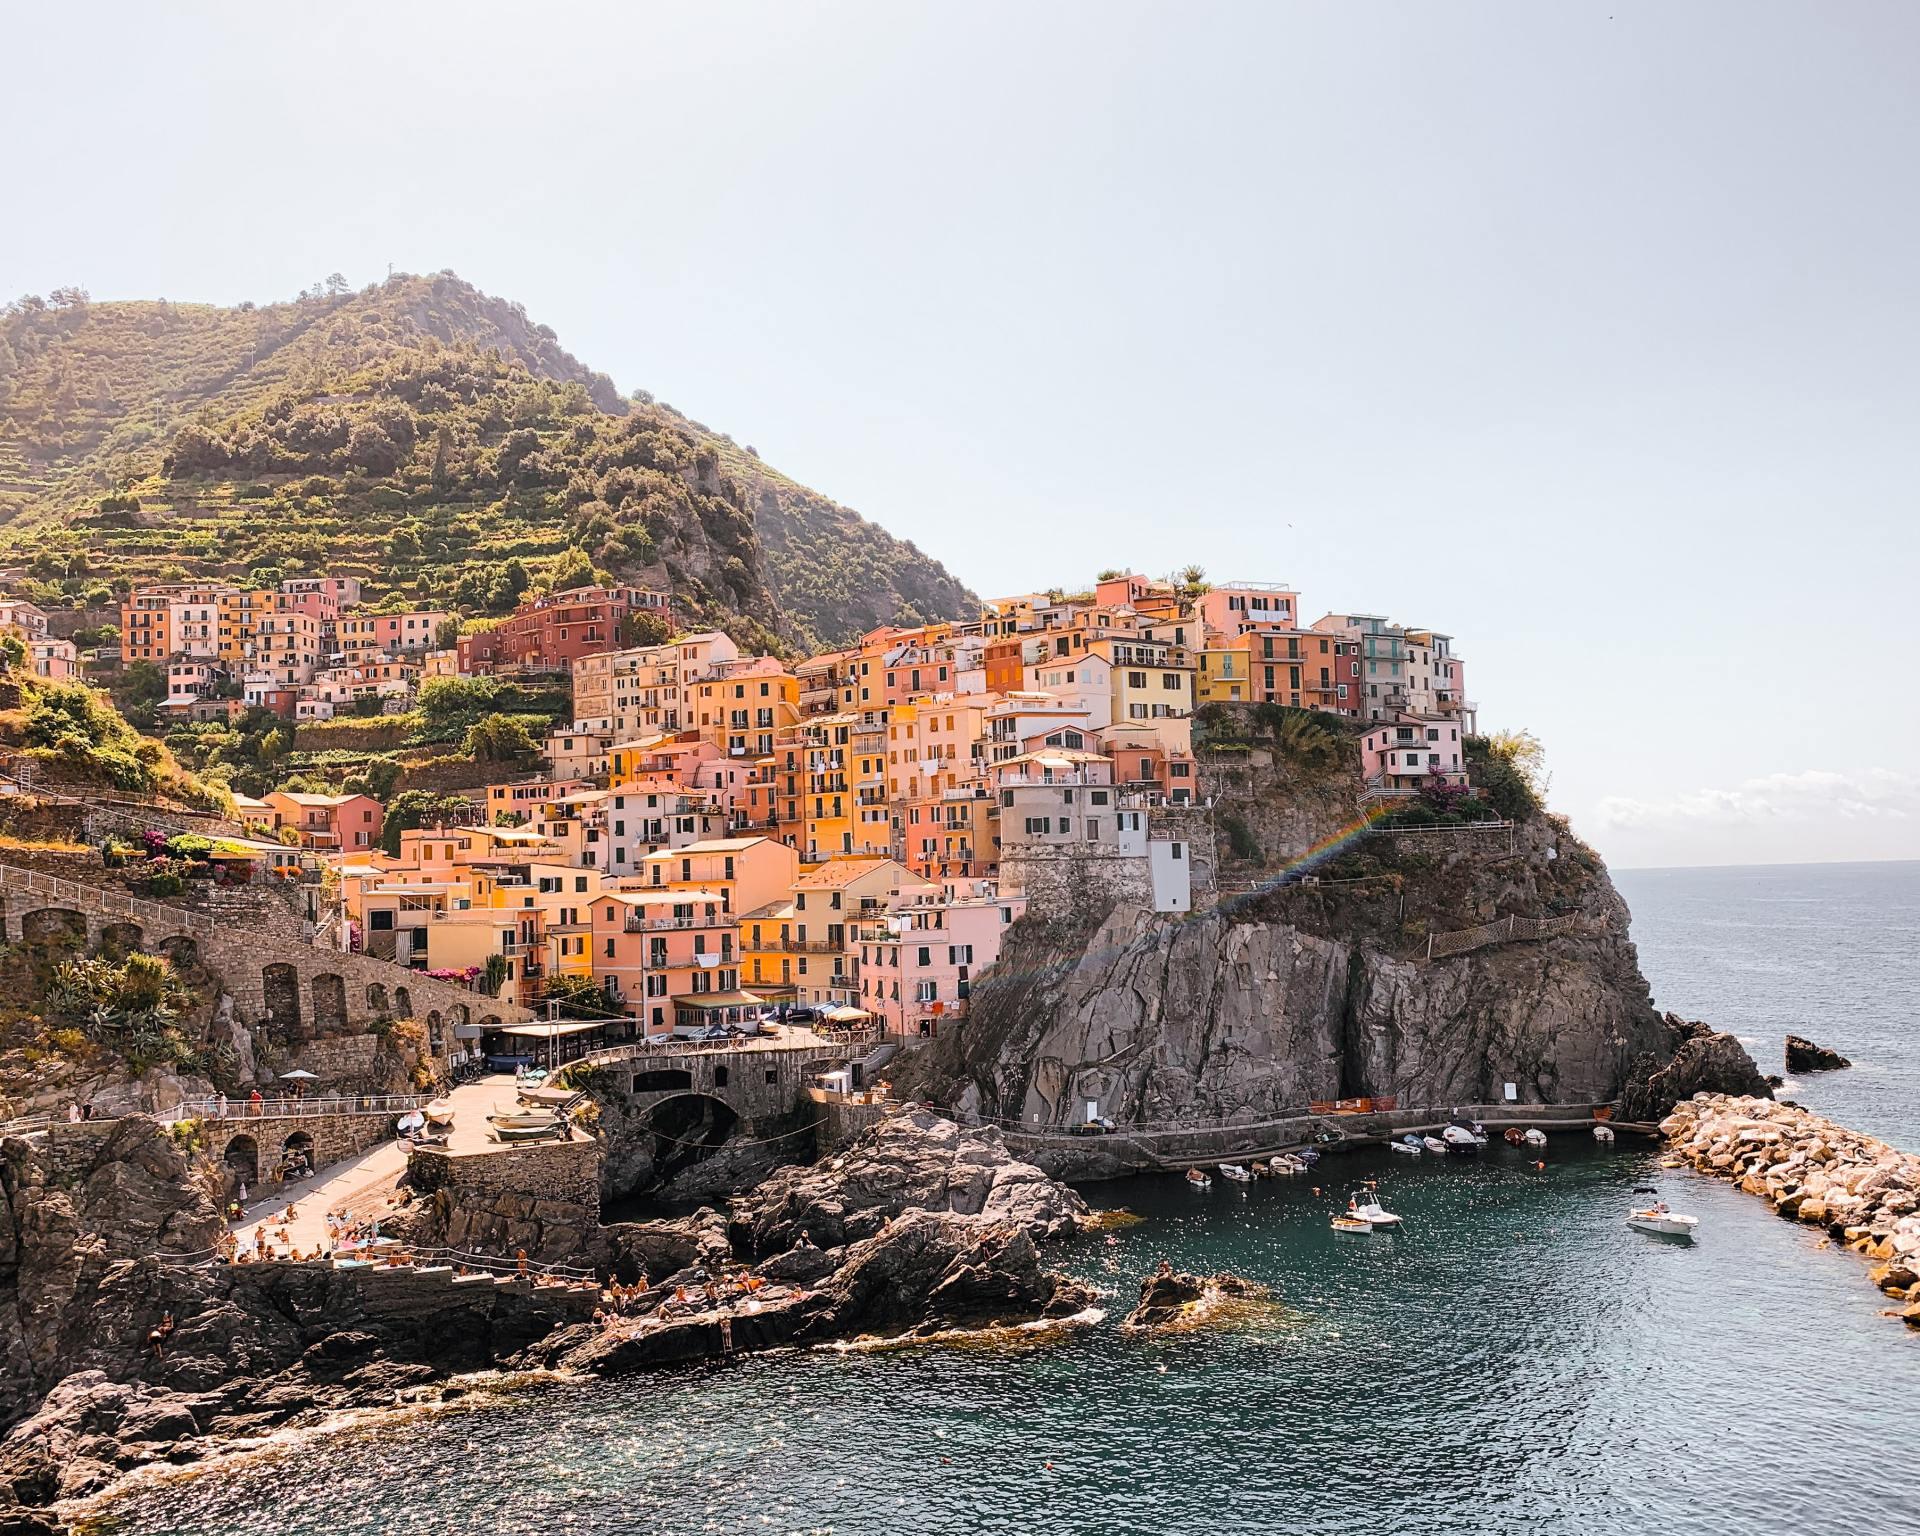 Couleur locale Italië - Cinque Terre Manarola kleurrijk vissersdorpje